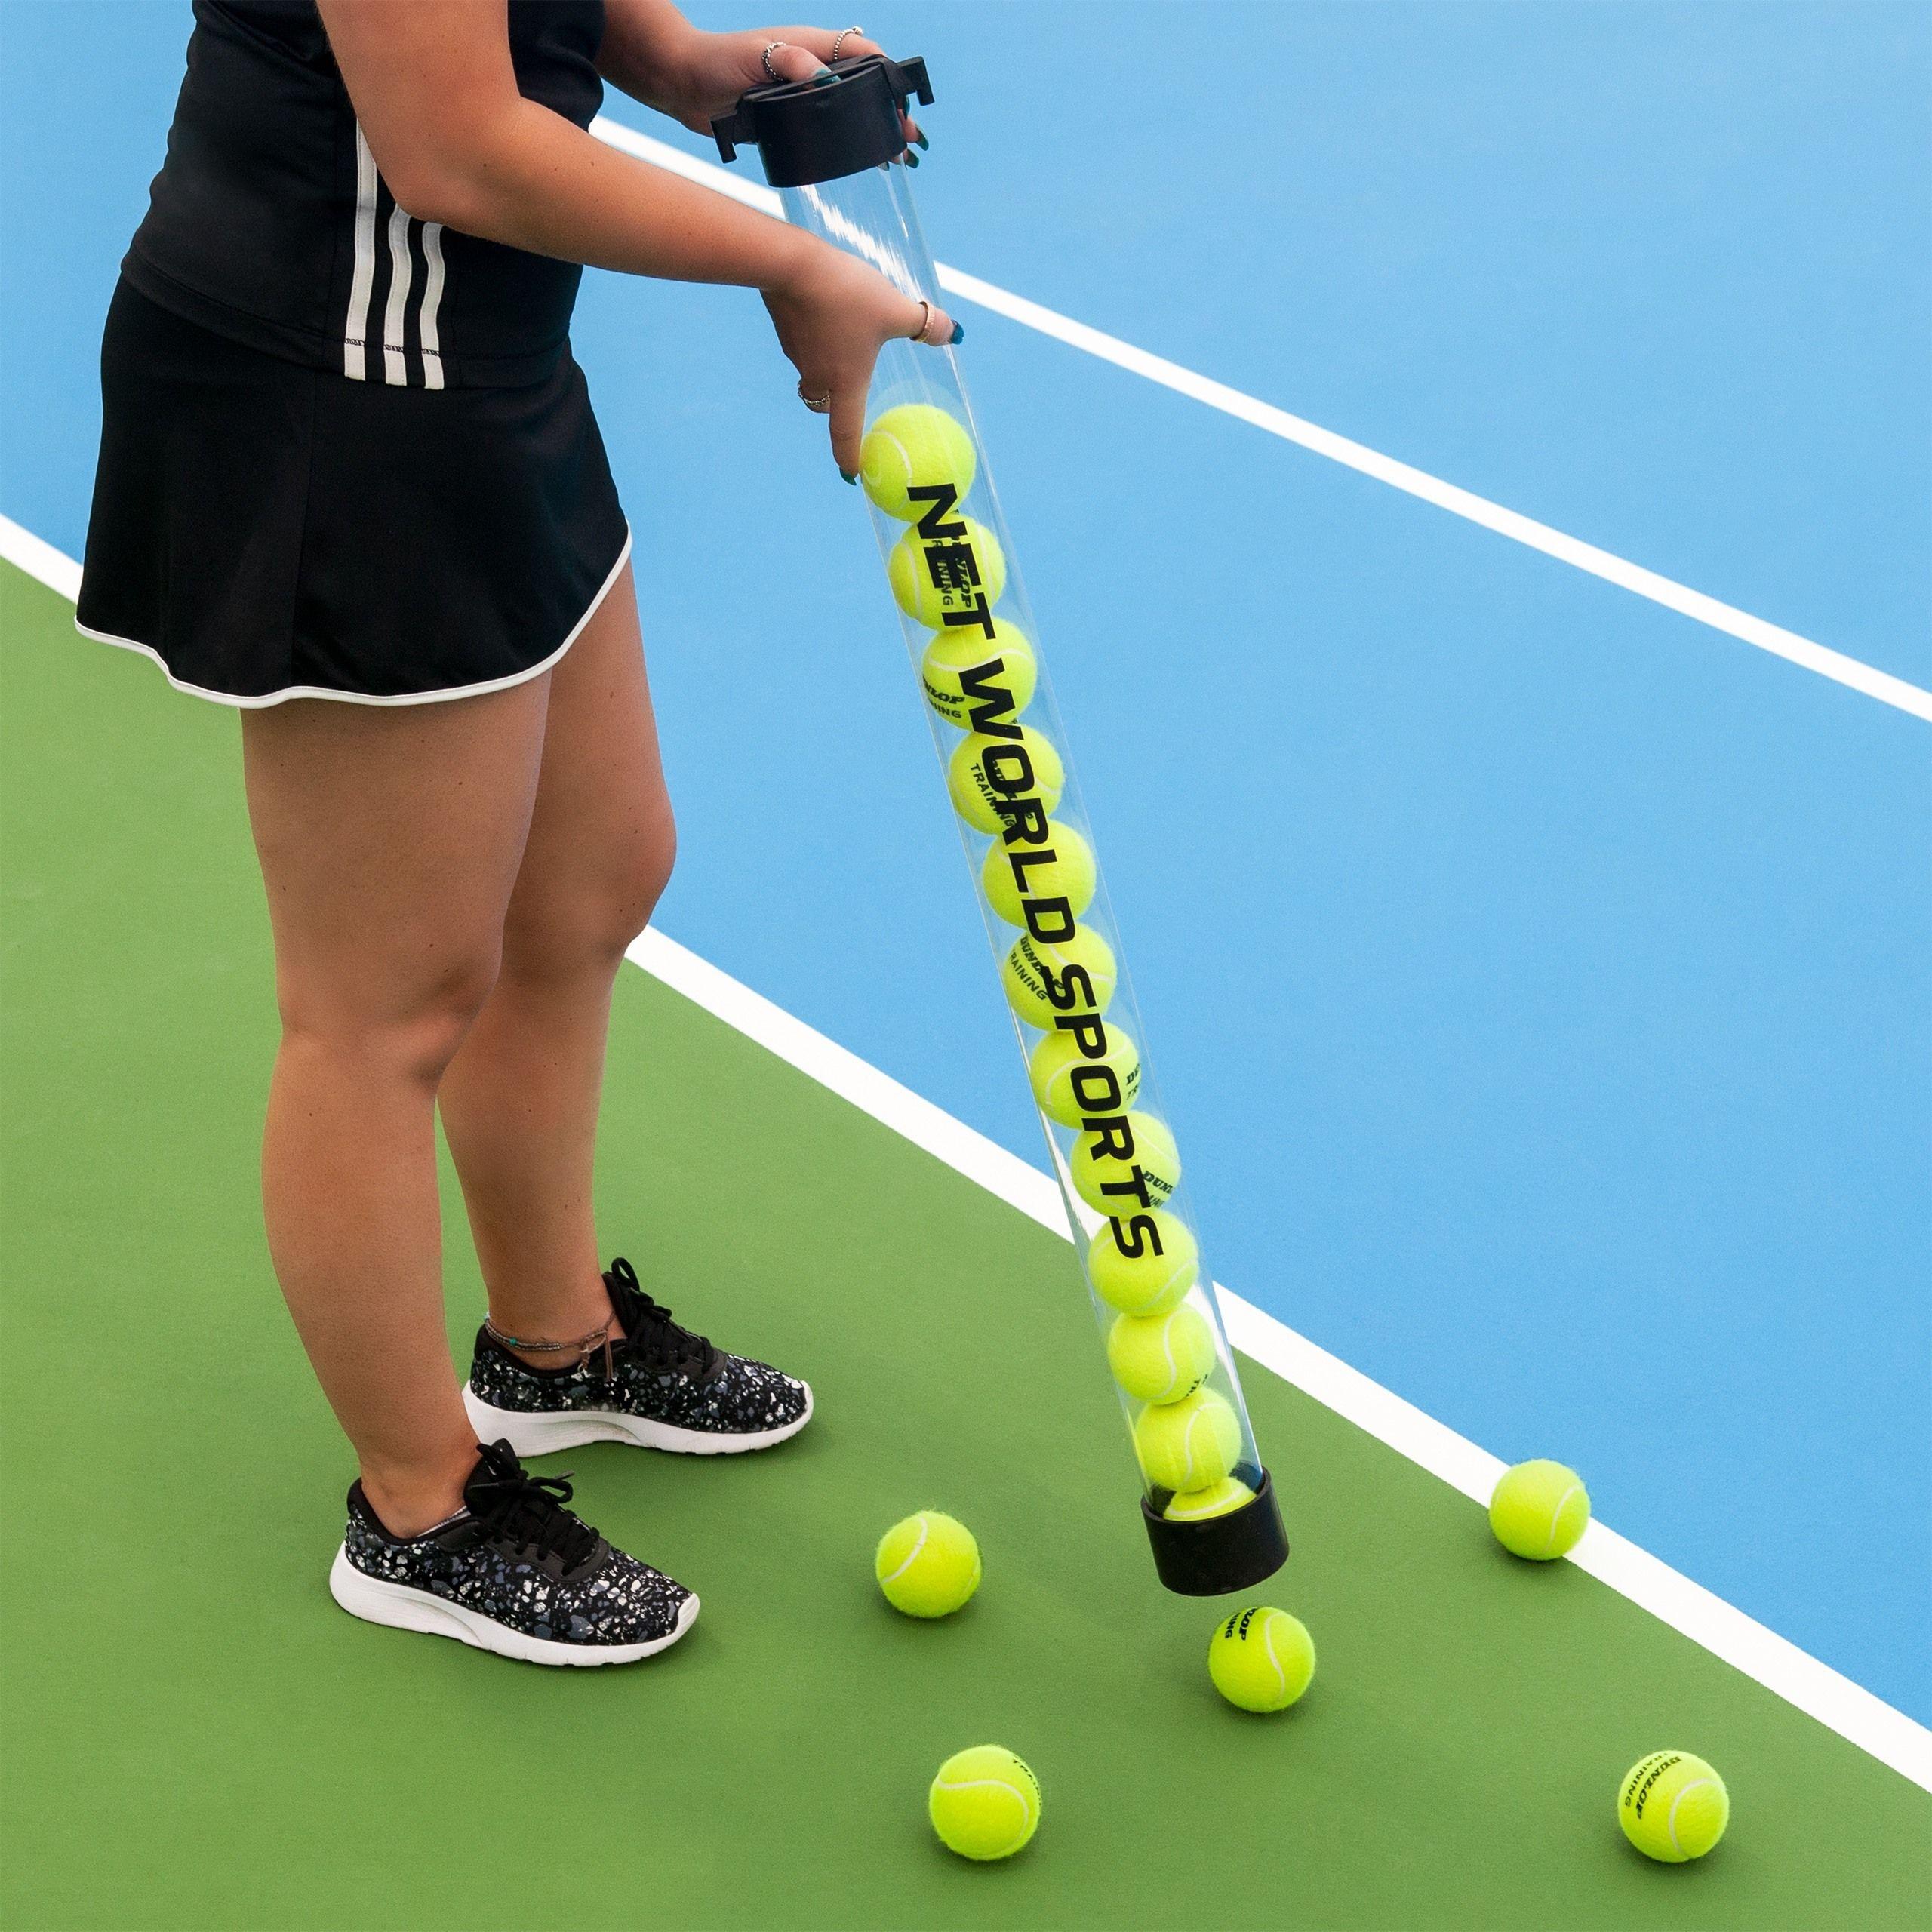 Tennis Ball Pick Up Tube Tennis Ball Tennis Ball